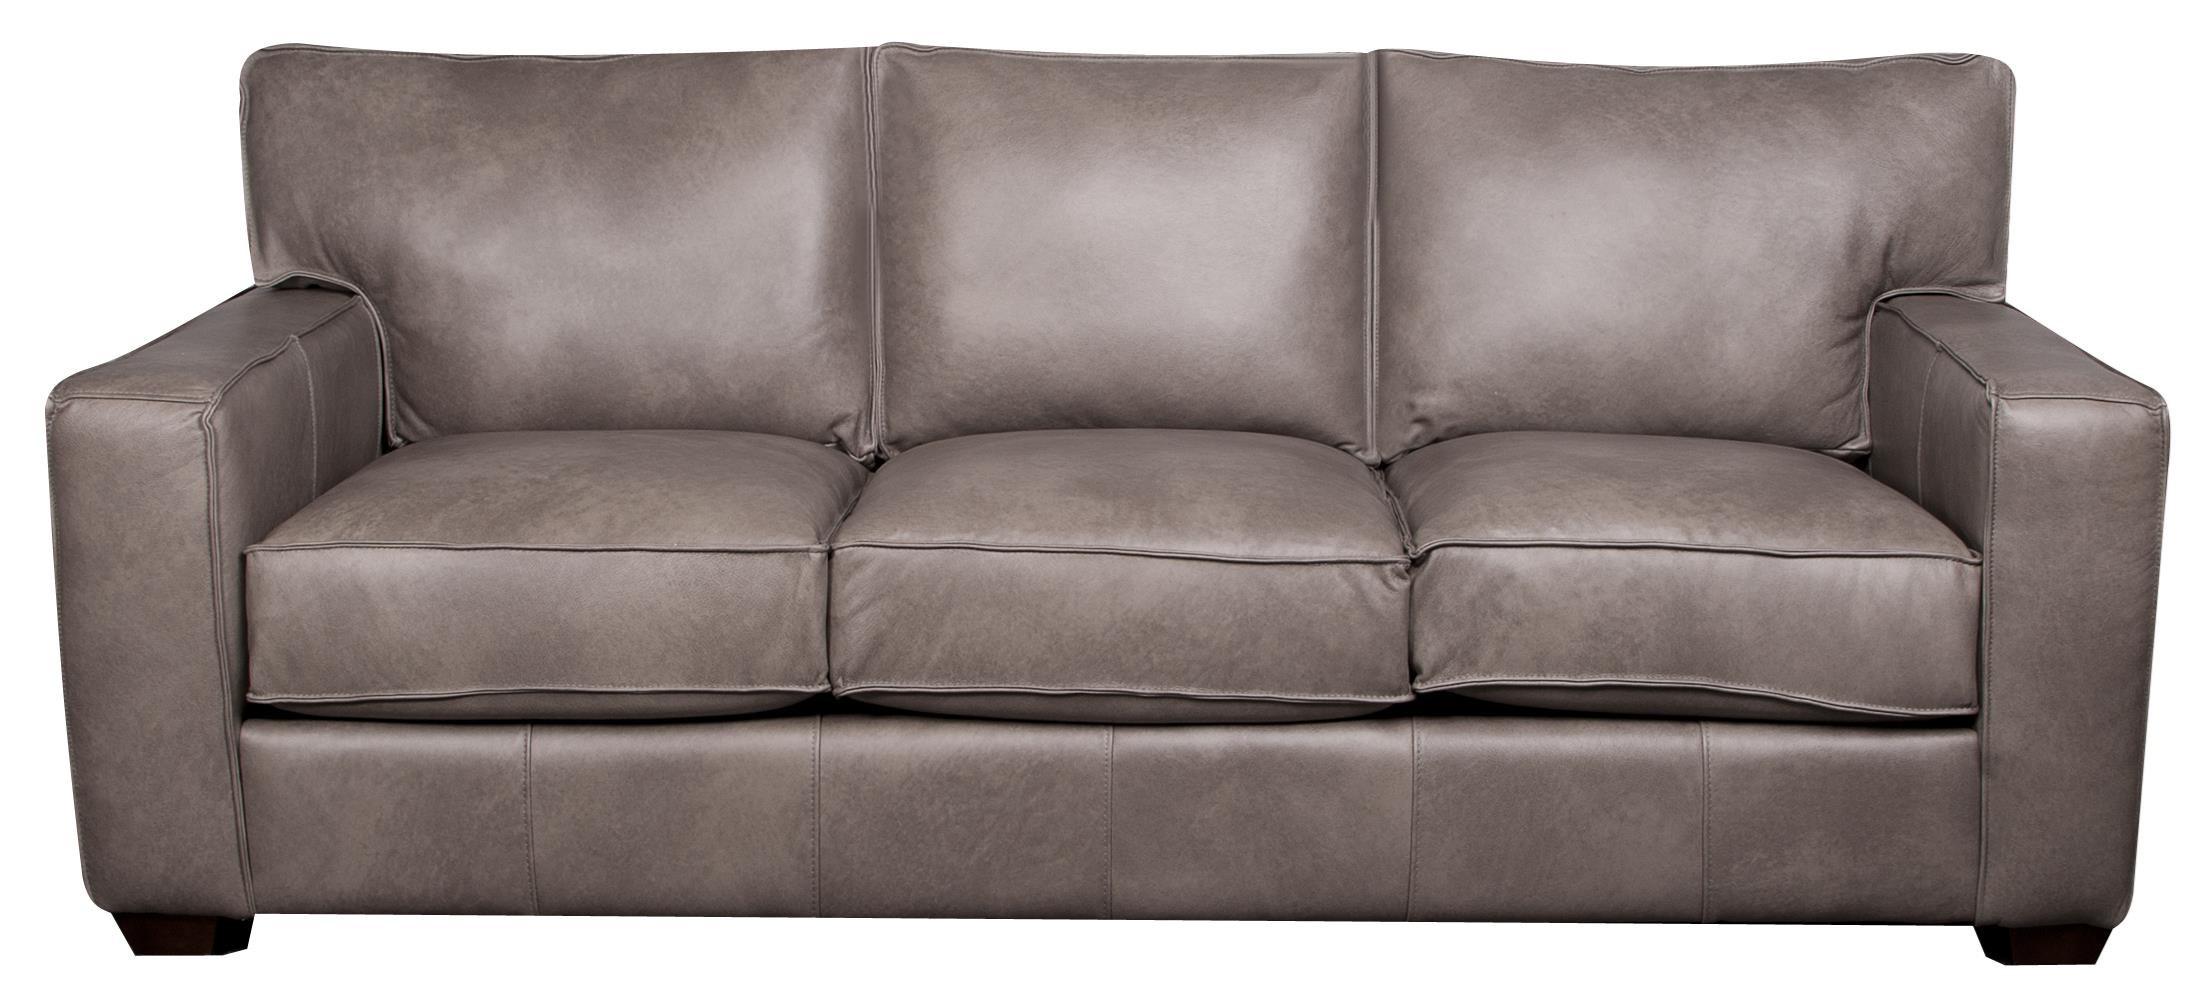 Elliston Place Telford Telford 100% Leather Sofa - Item Number: 795266593